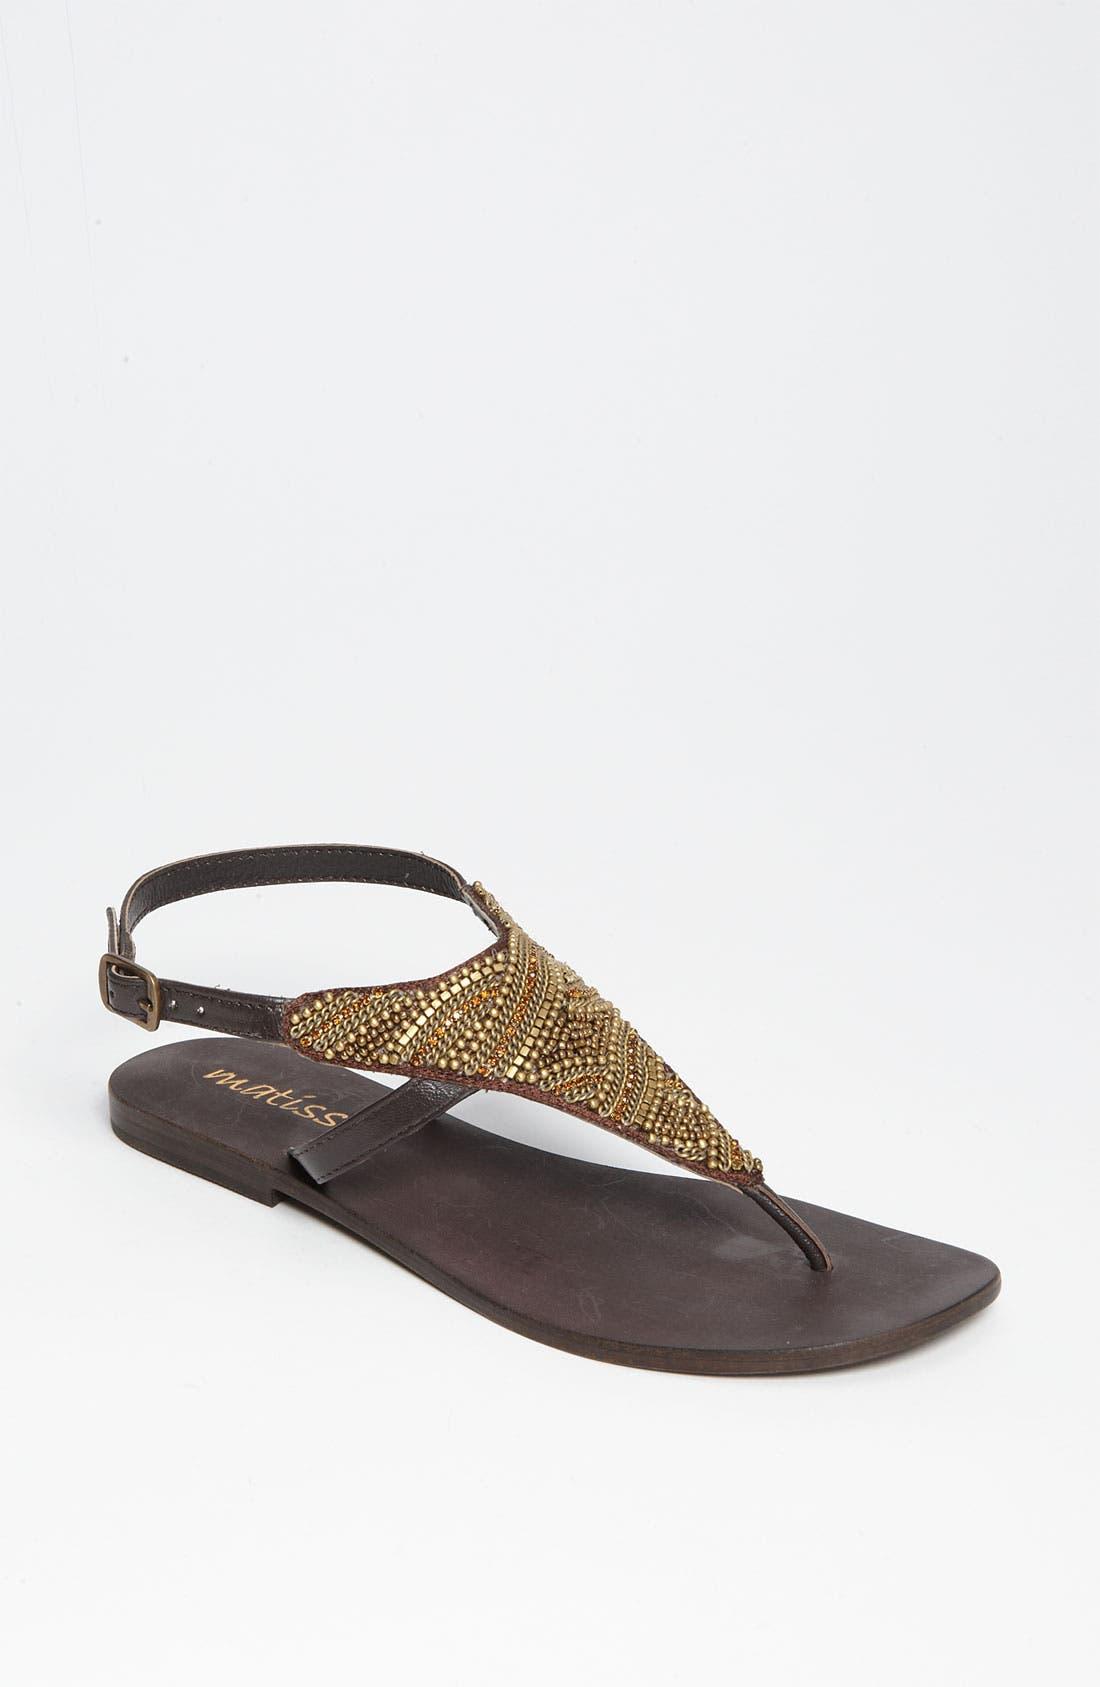 Main Image - Matisse 'Dina' Sandal